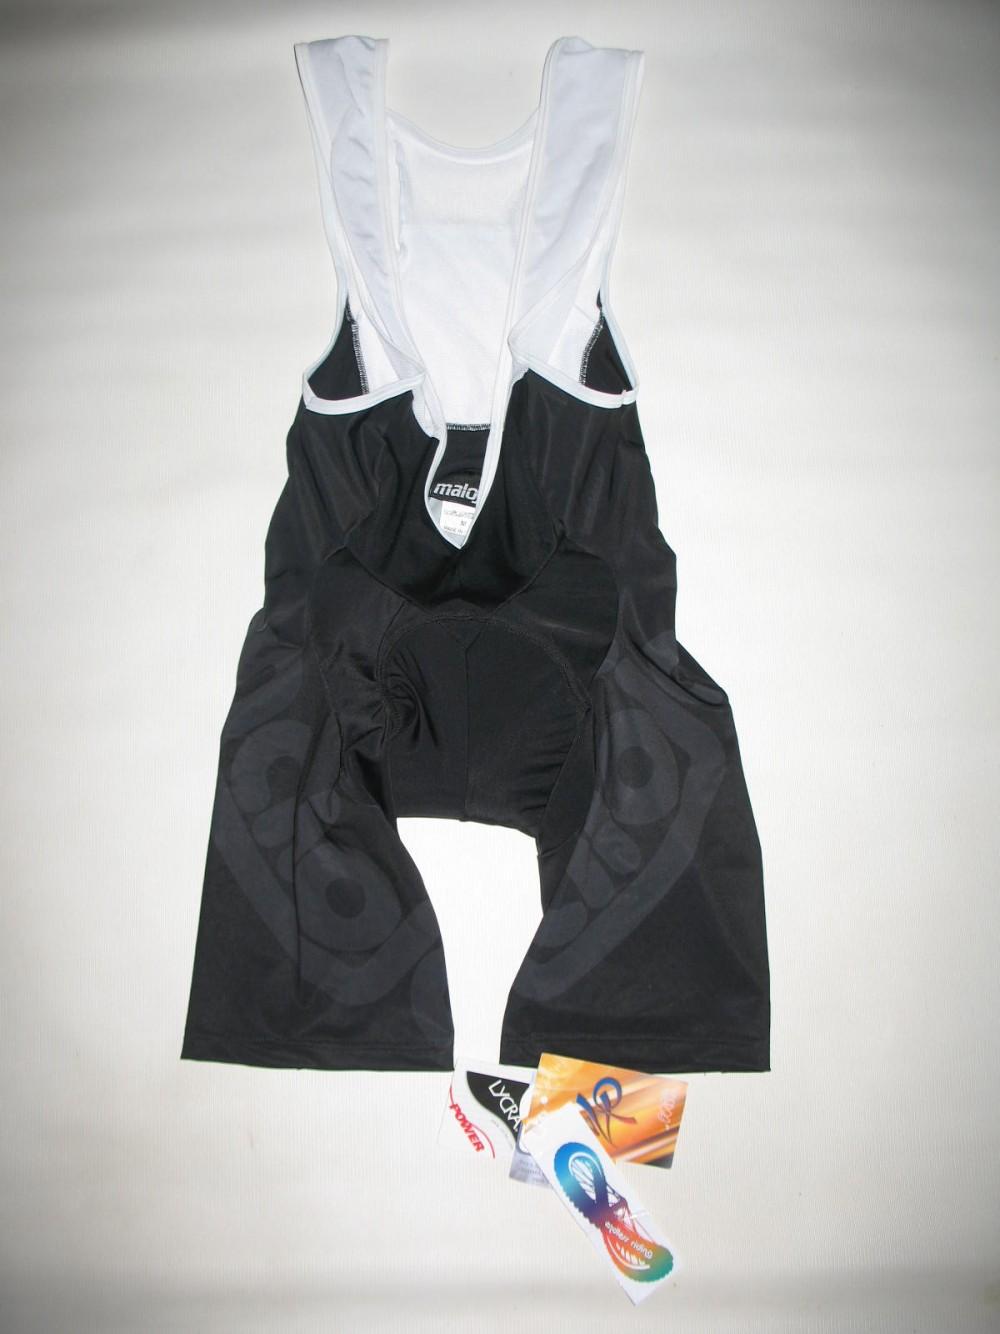 Велошорты MALOJA race bib cycling shorts (размер M) - 3